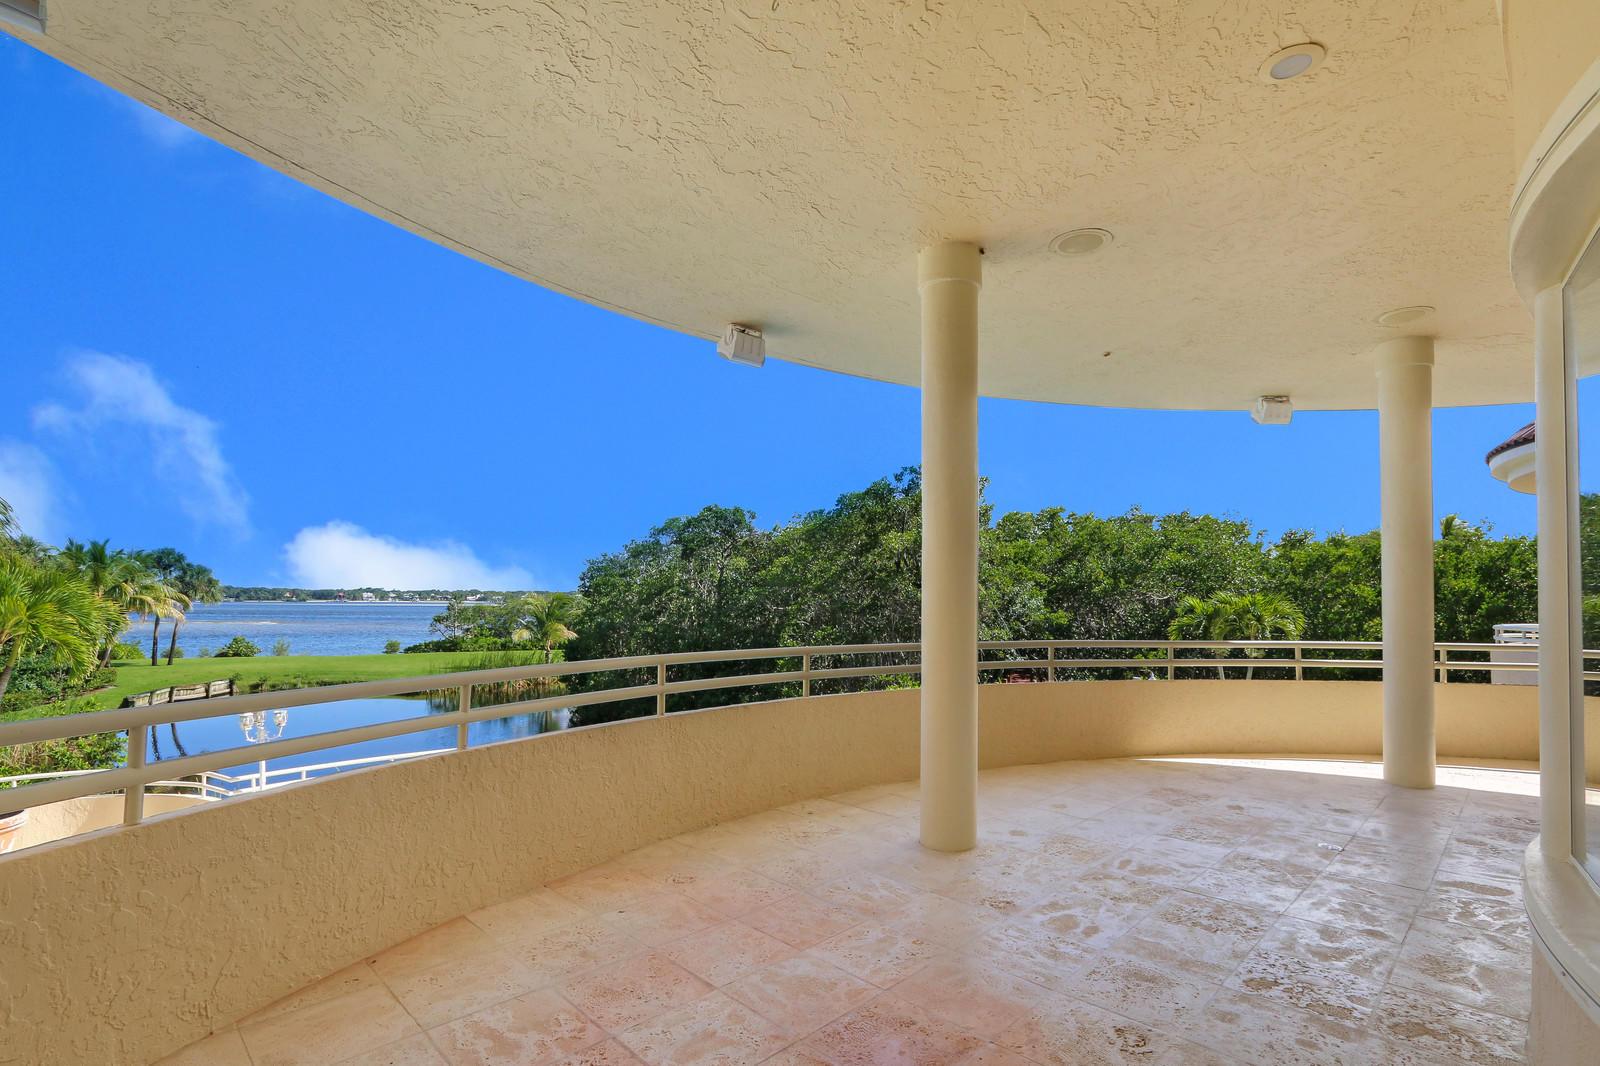 HIGH POINT ISLE SEWALLS POINT FLORIDA